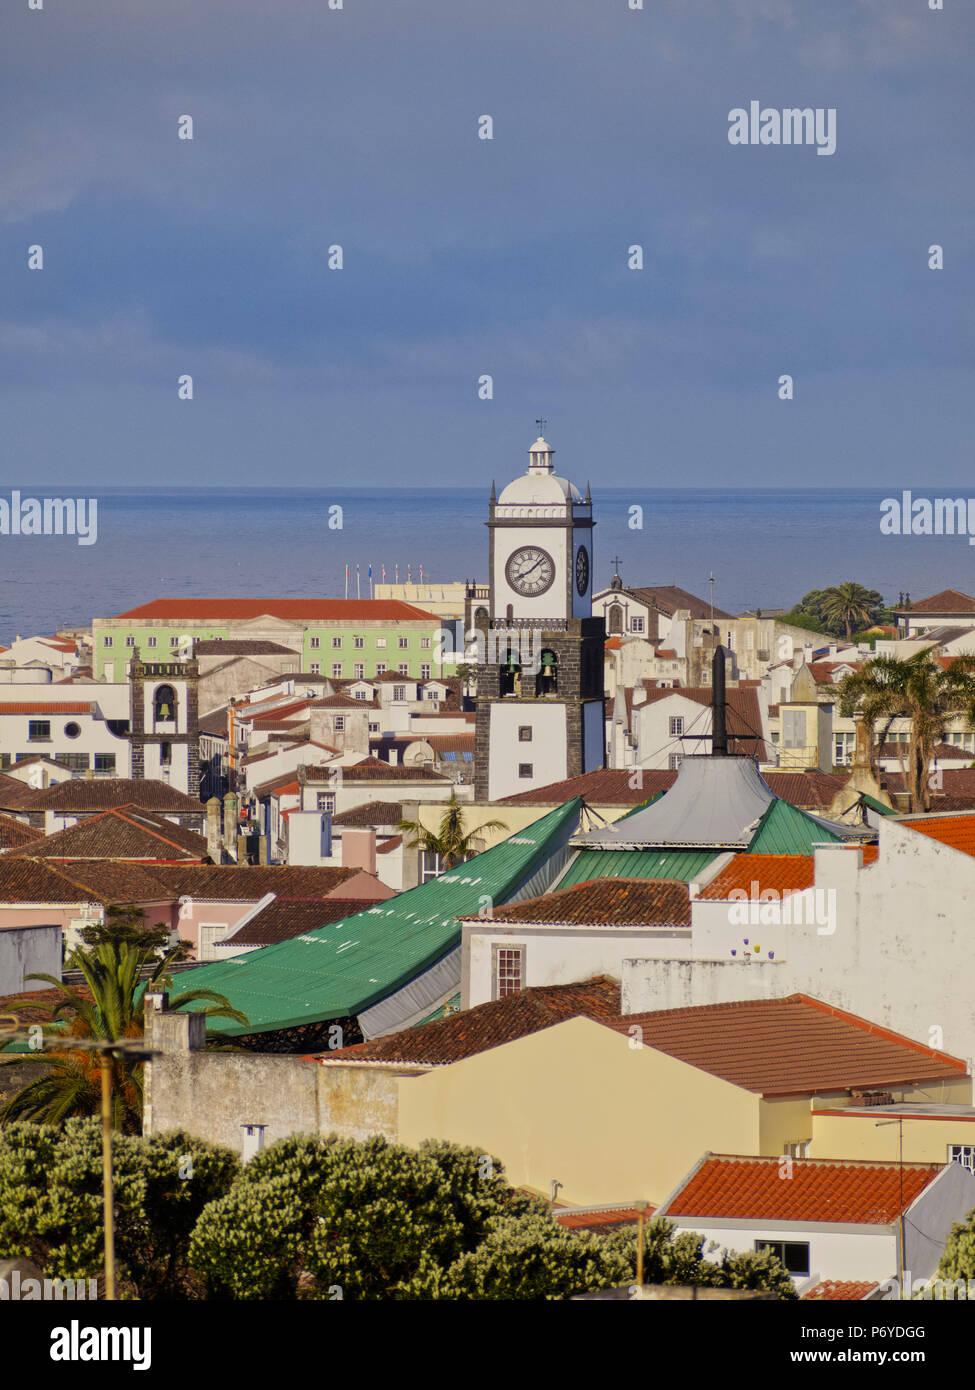 Portugal, Azoren, Sao Miguel, Ponta Delgada, erhöhten Blick auf die Altstadt. Stockbild